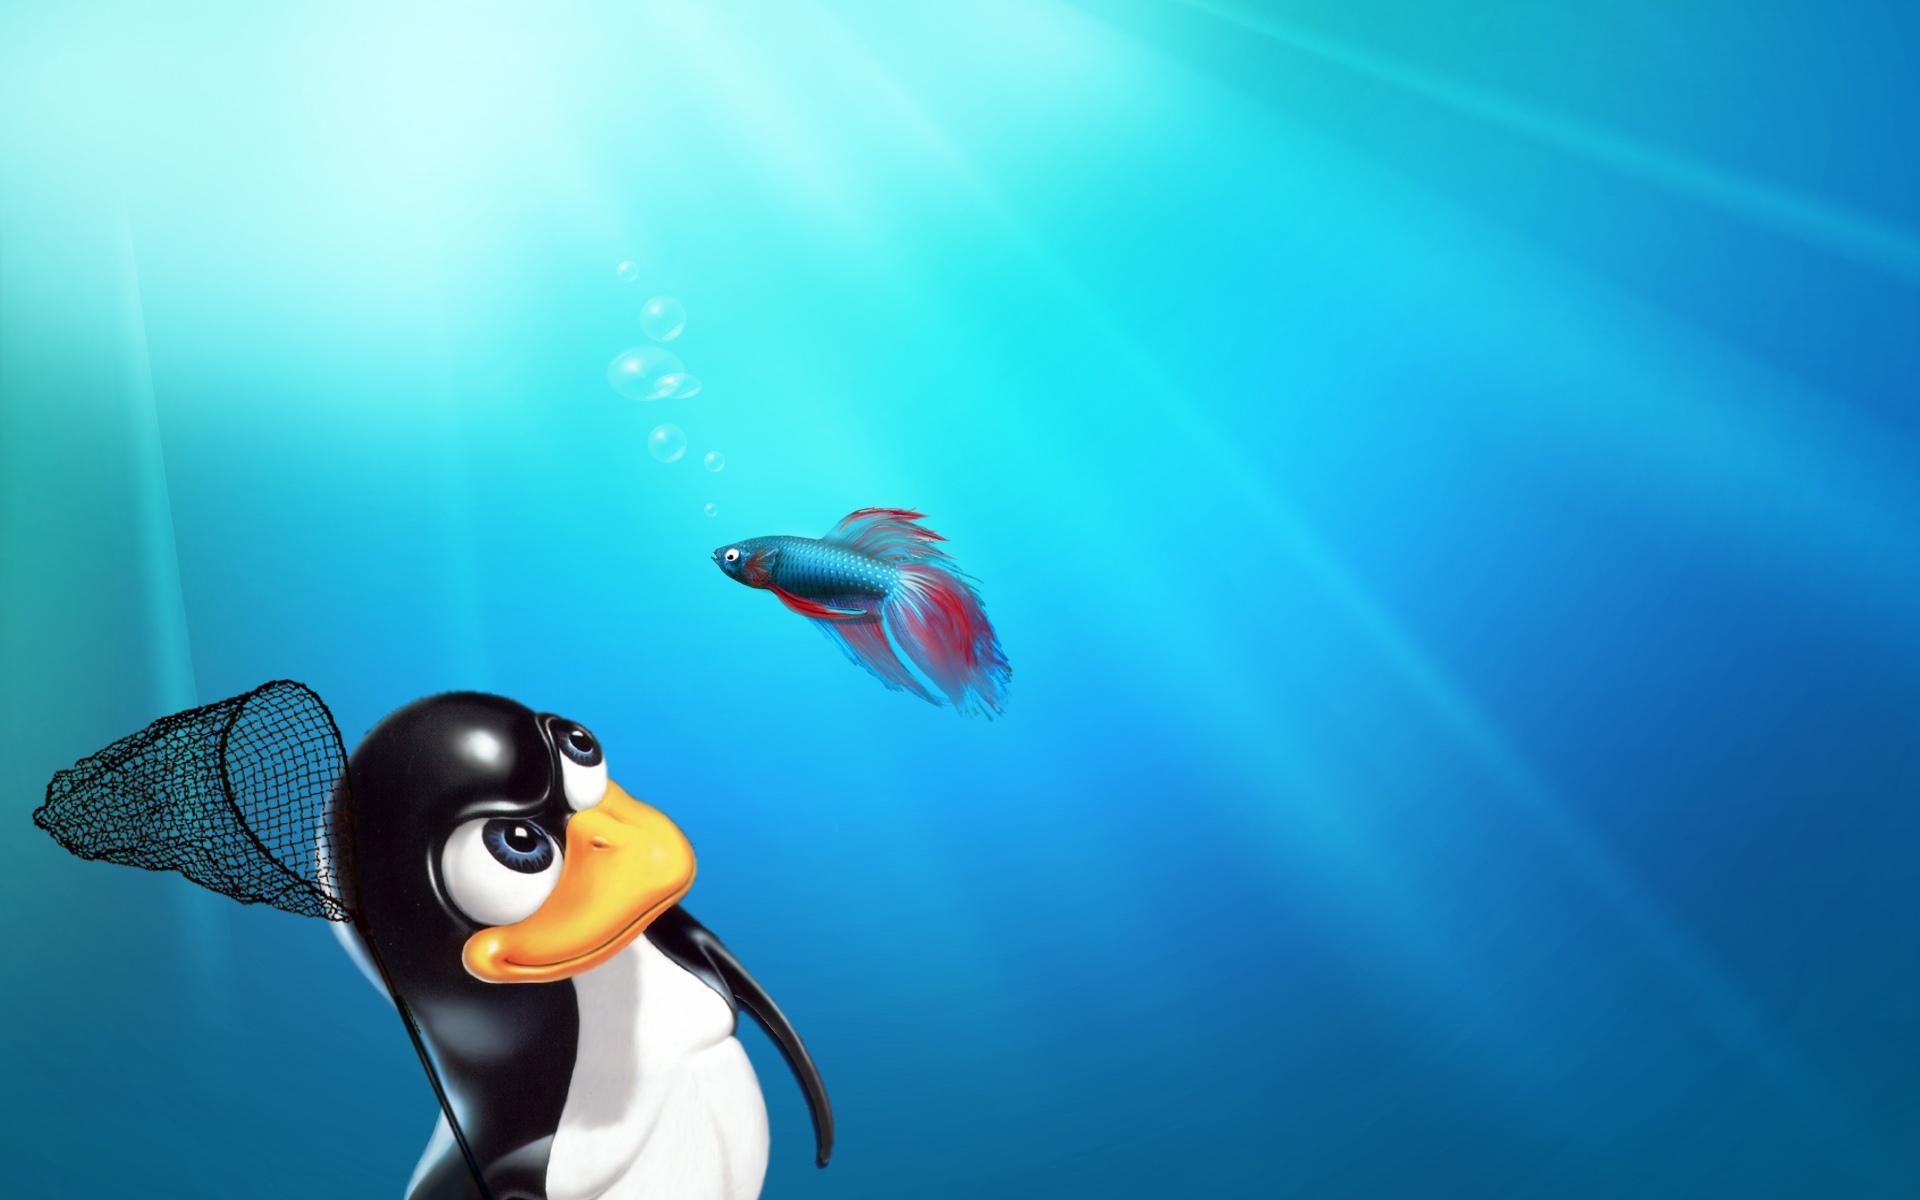 Linux Wallpaper Wallpaper 1920x1200